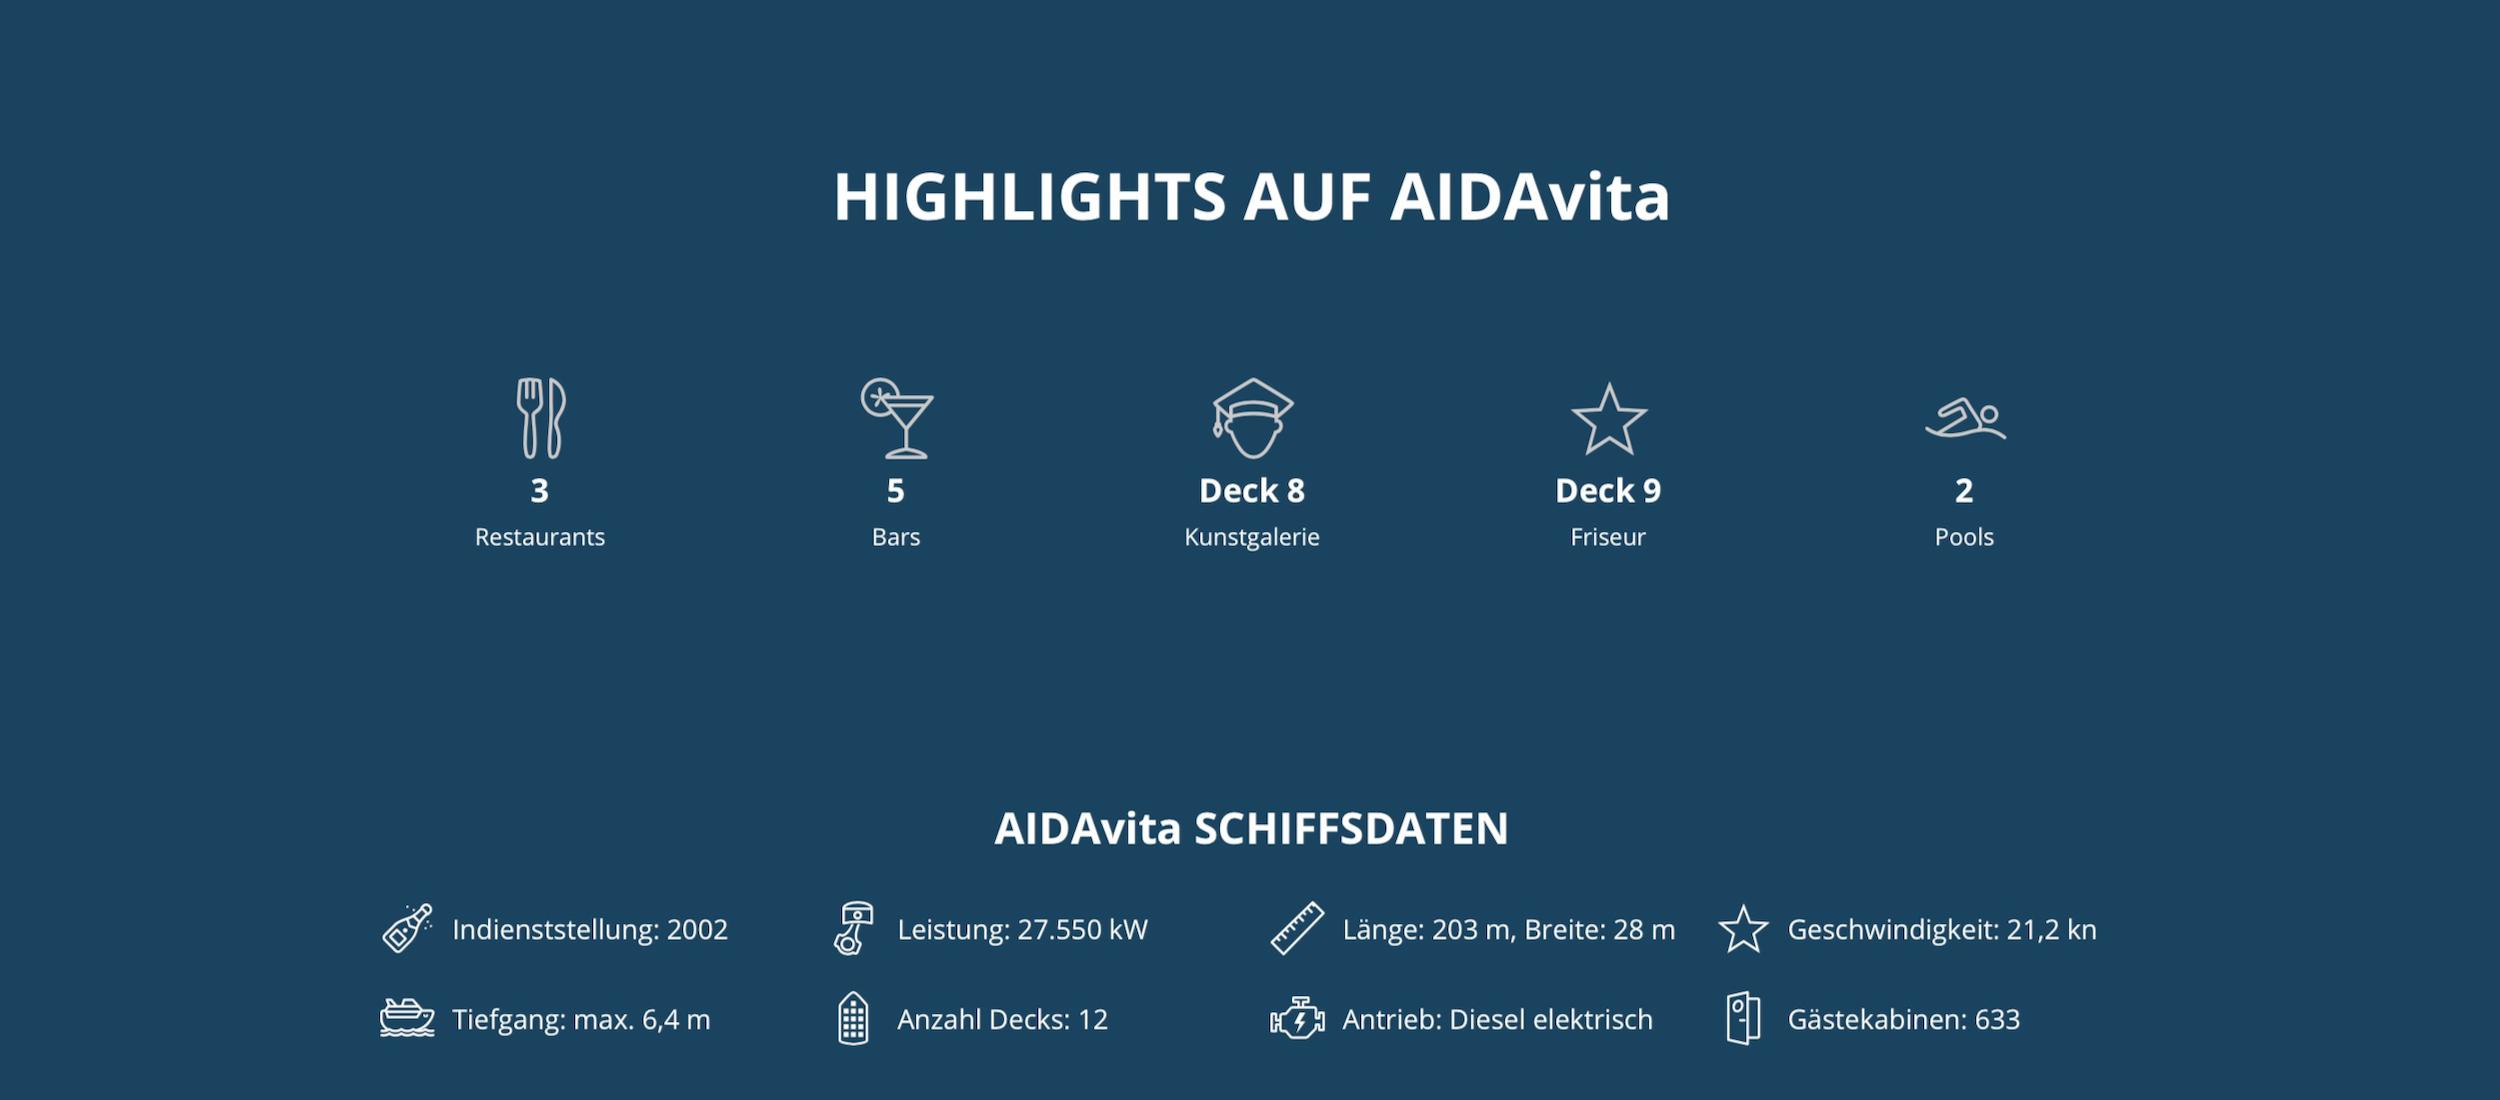 aida-cruises-ships-aidavita-daten